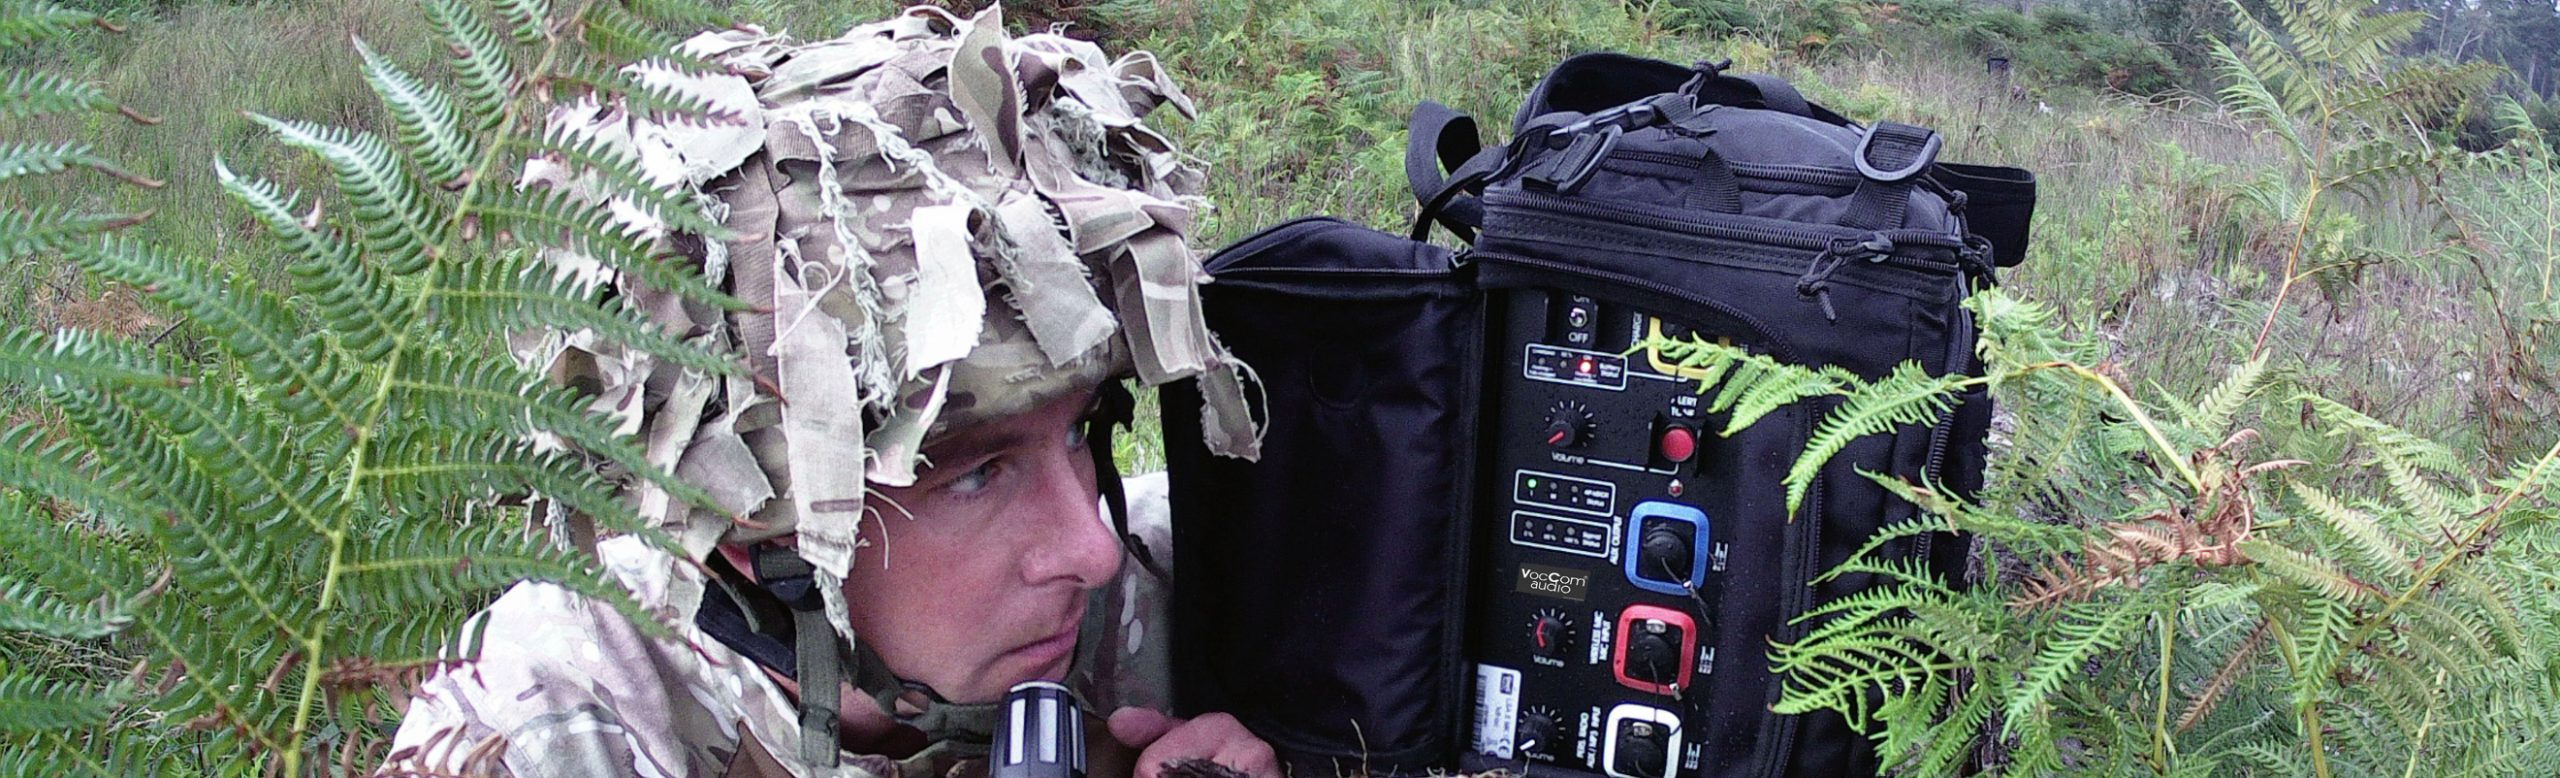 Mobile Loudspeaker LSA-X-MK2 used by army soldier